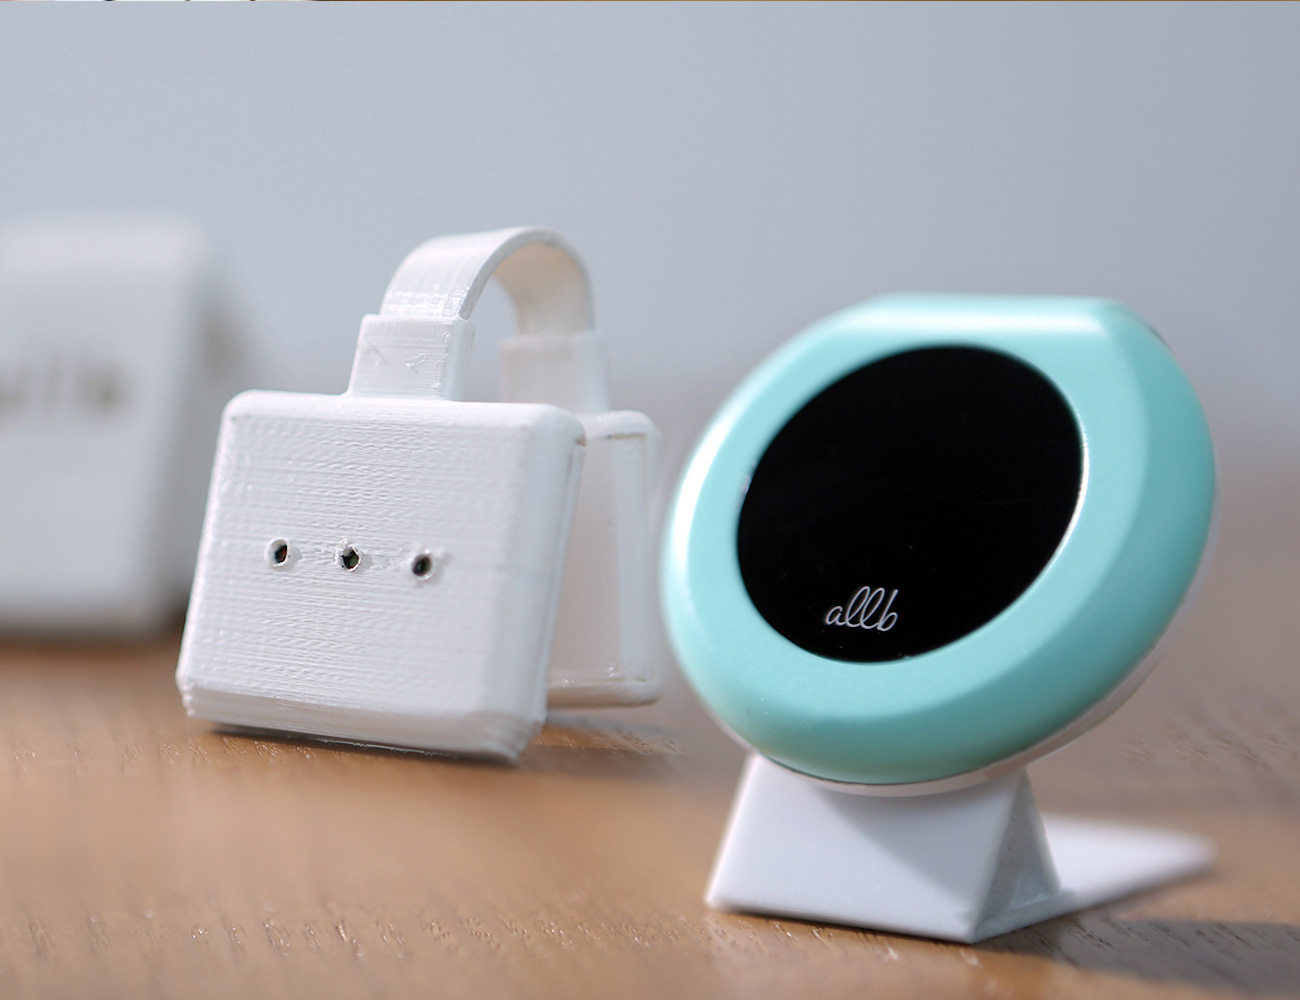 allb – The Smart Wearable for Infants